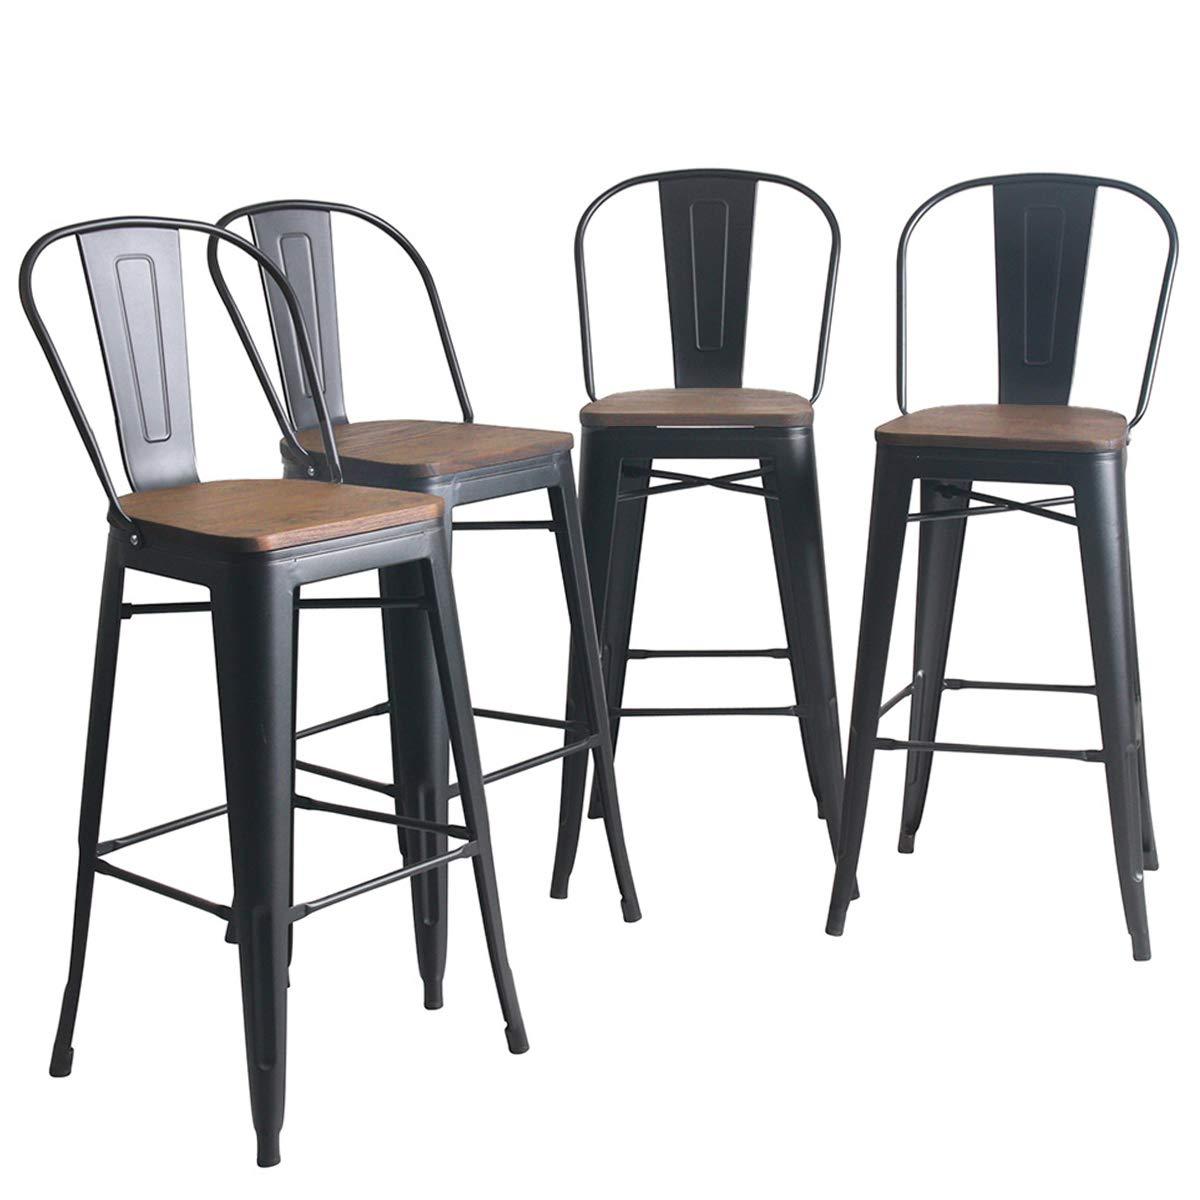 YongQiang Metal Bar Stools Set of 4 High Back Wooden Seat Industrial Indoor Outdoor Bar Chairs 30'' Matte Black by YongQiang